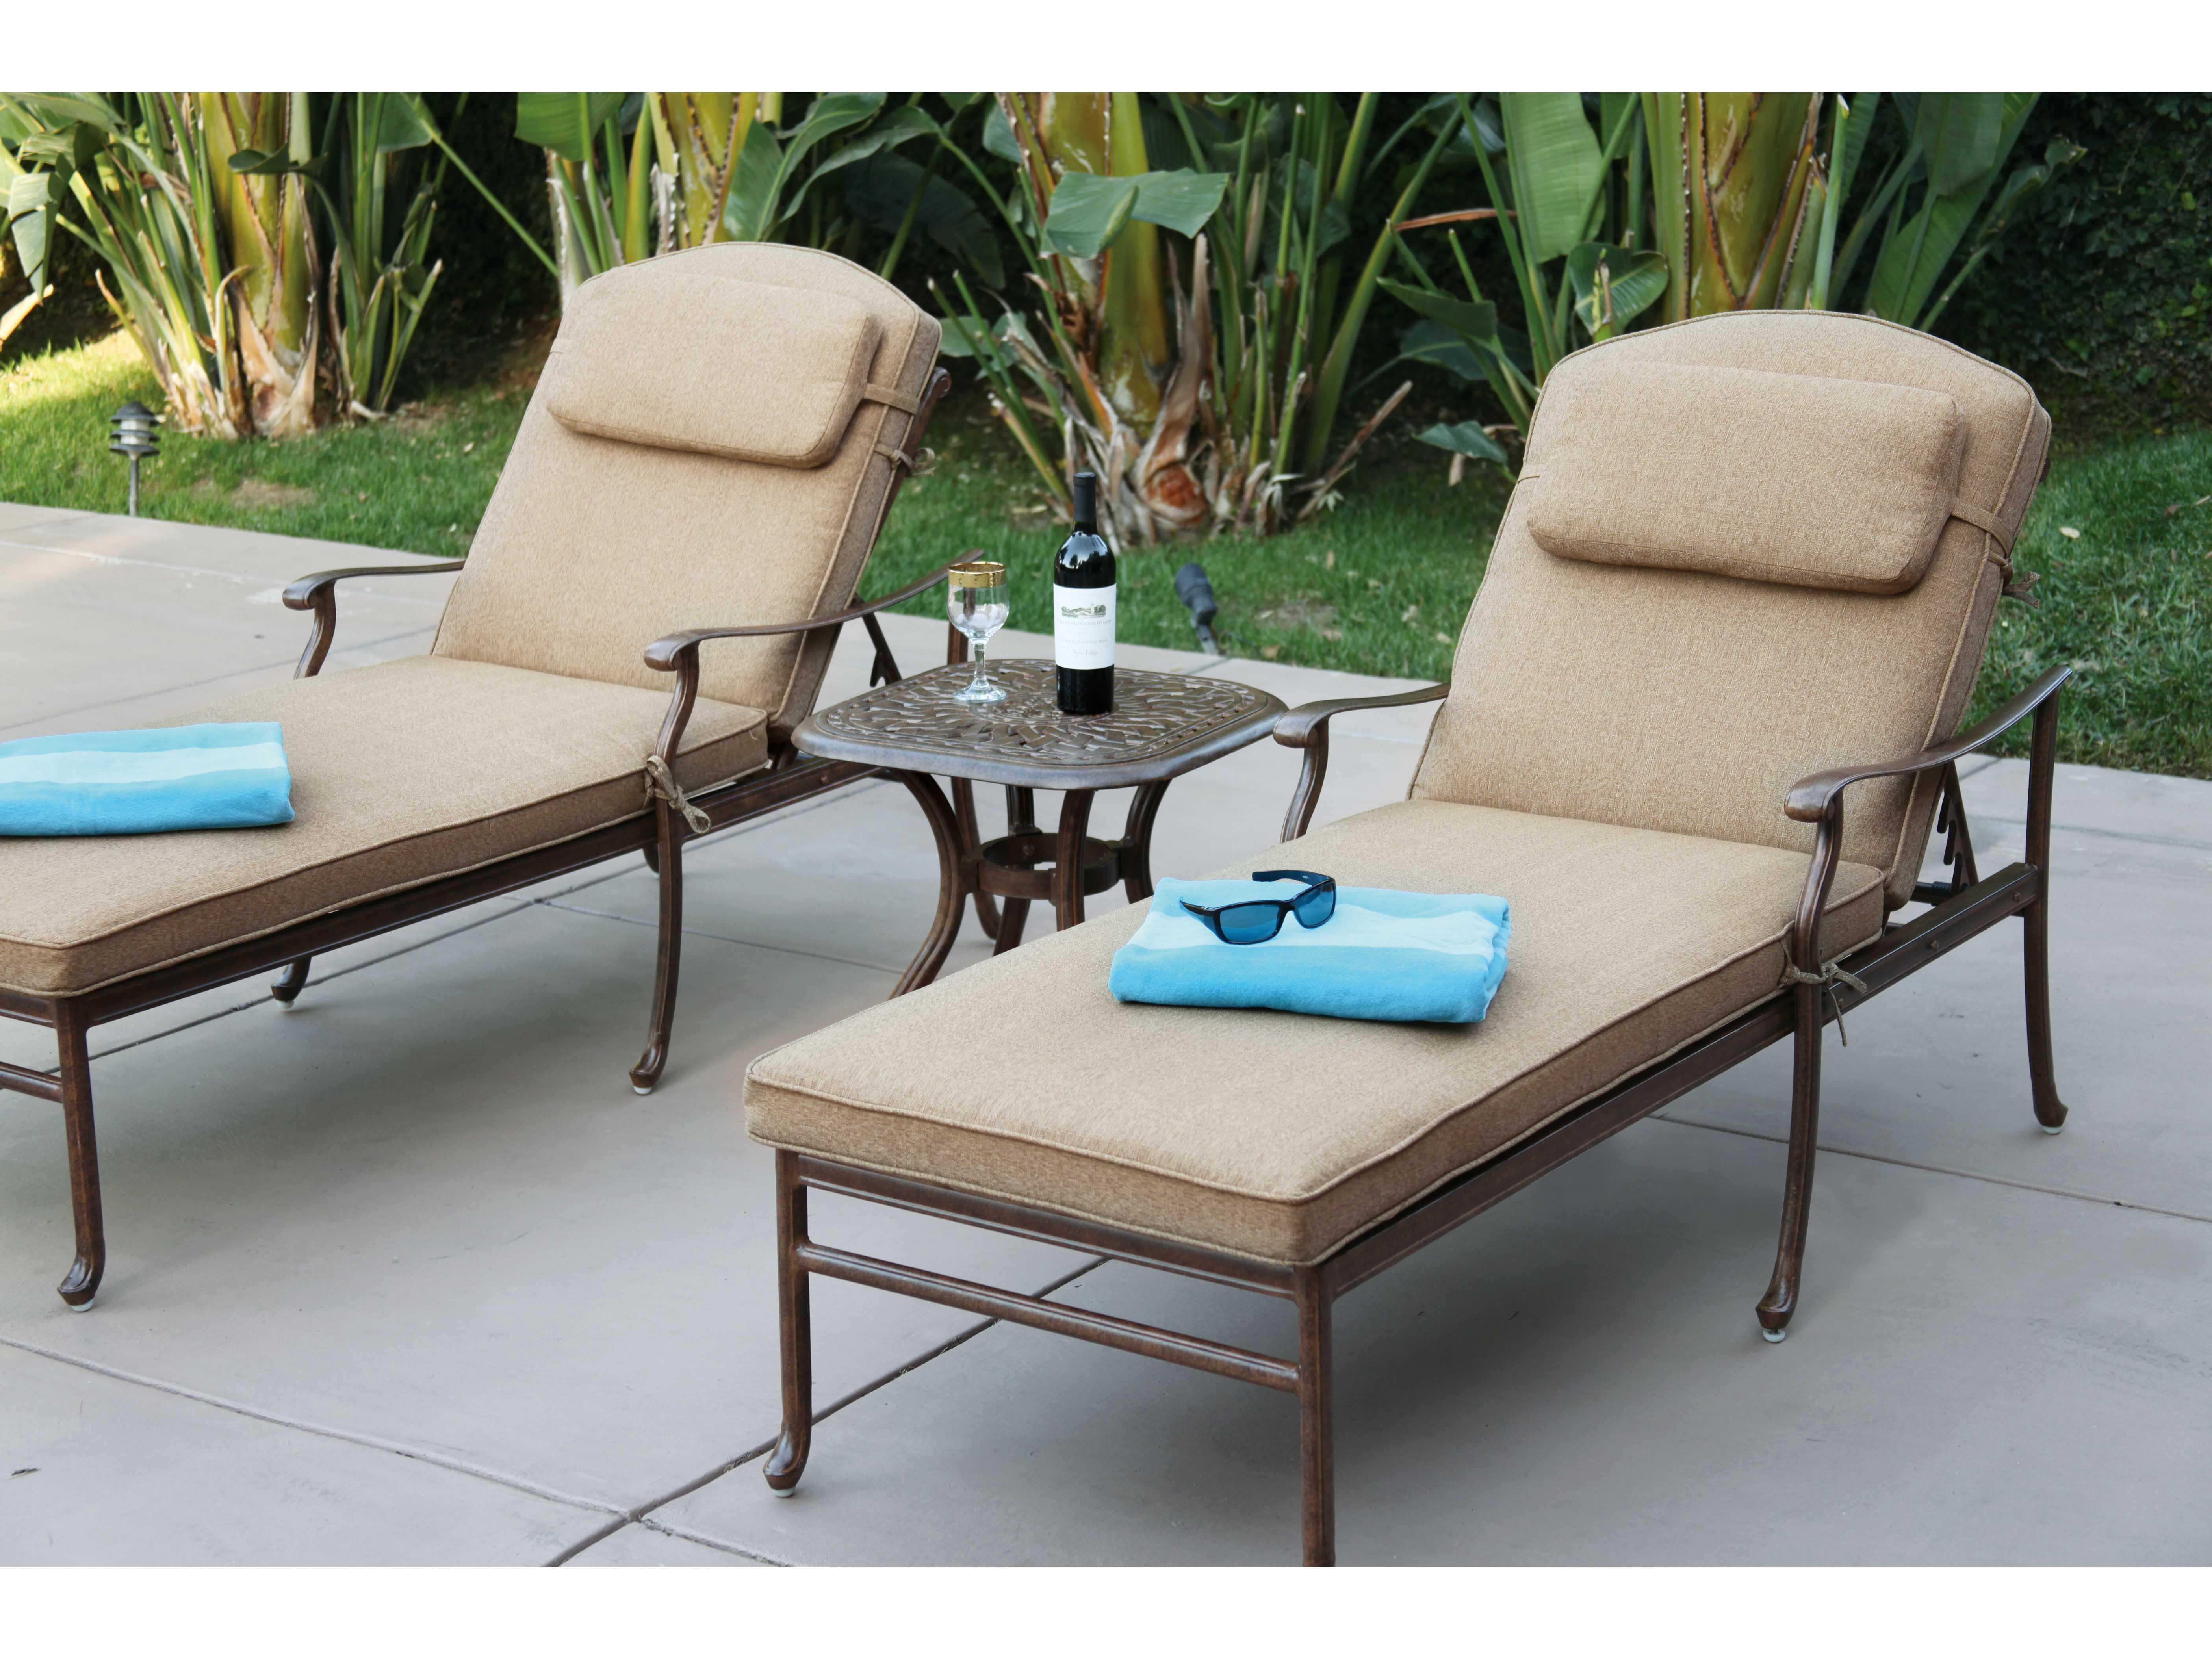 Darlee outdoor living florence cast aluminum chaise lounge for Cast aluminum outdoor chaise lounge